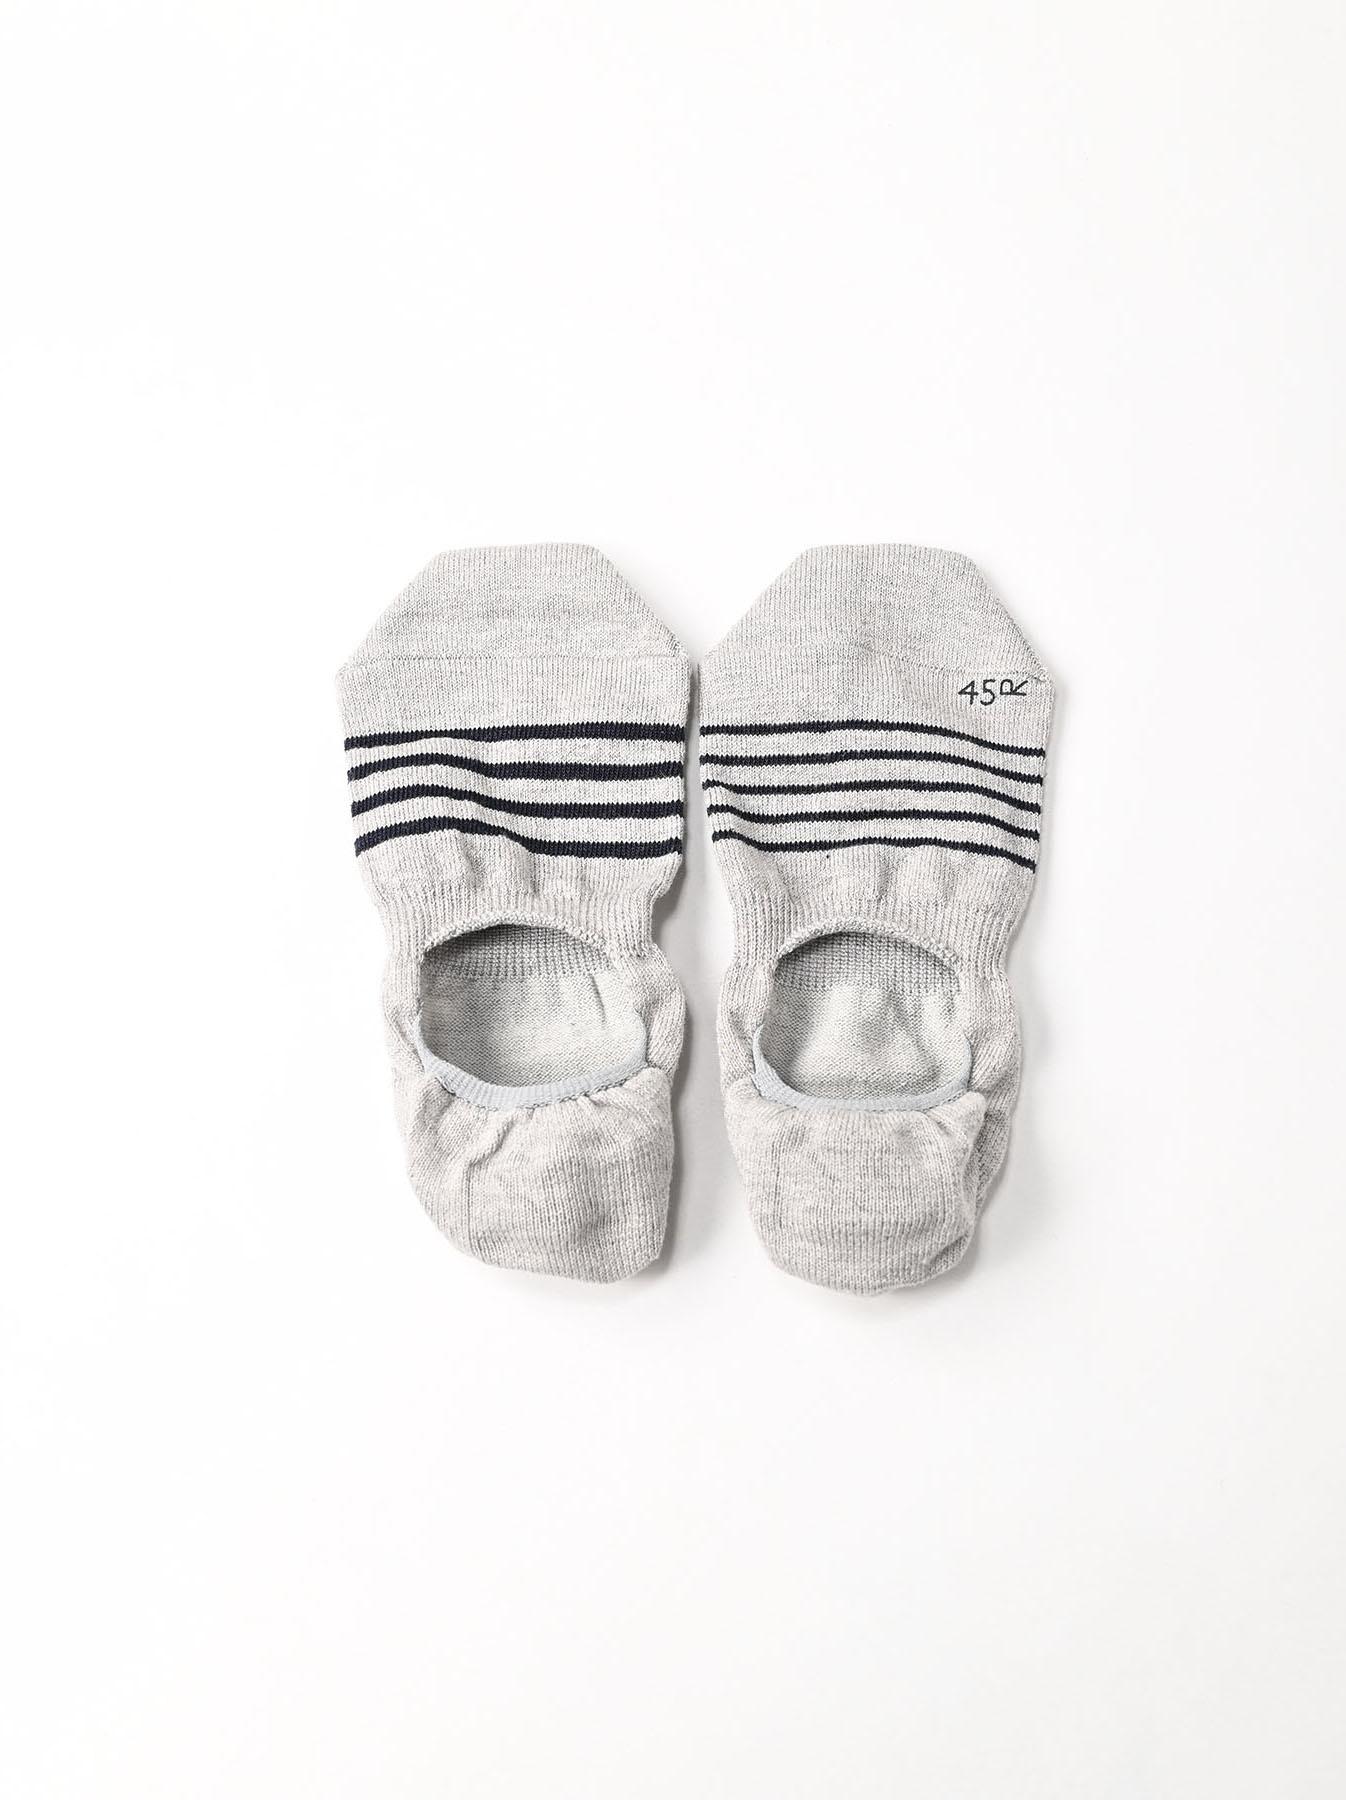 Basque Border Sole Socks (0321)-5